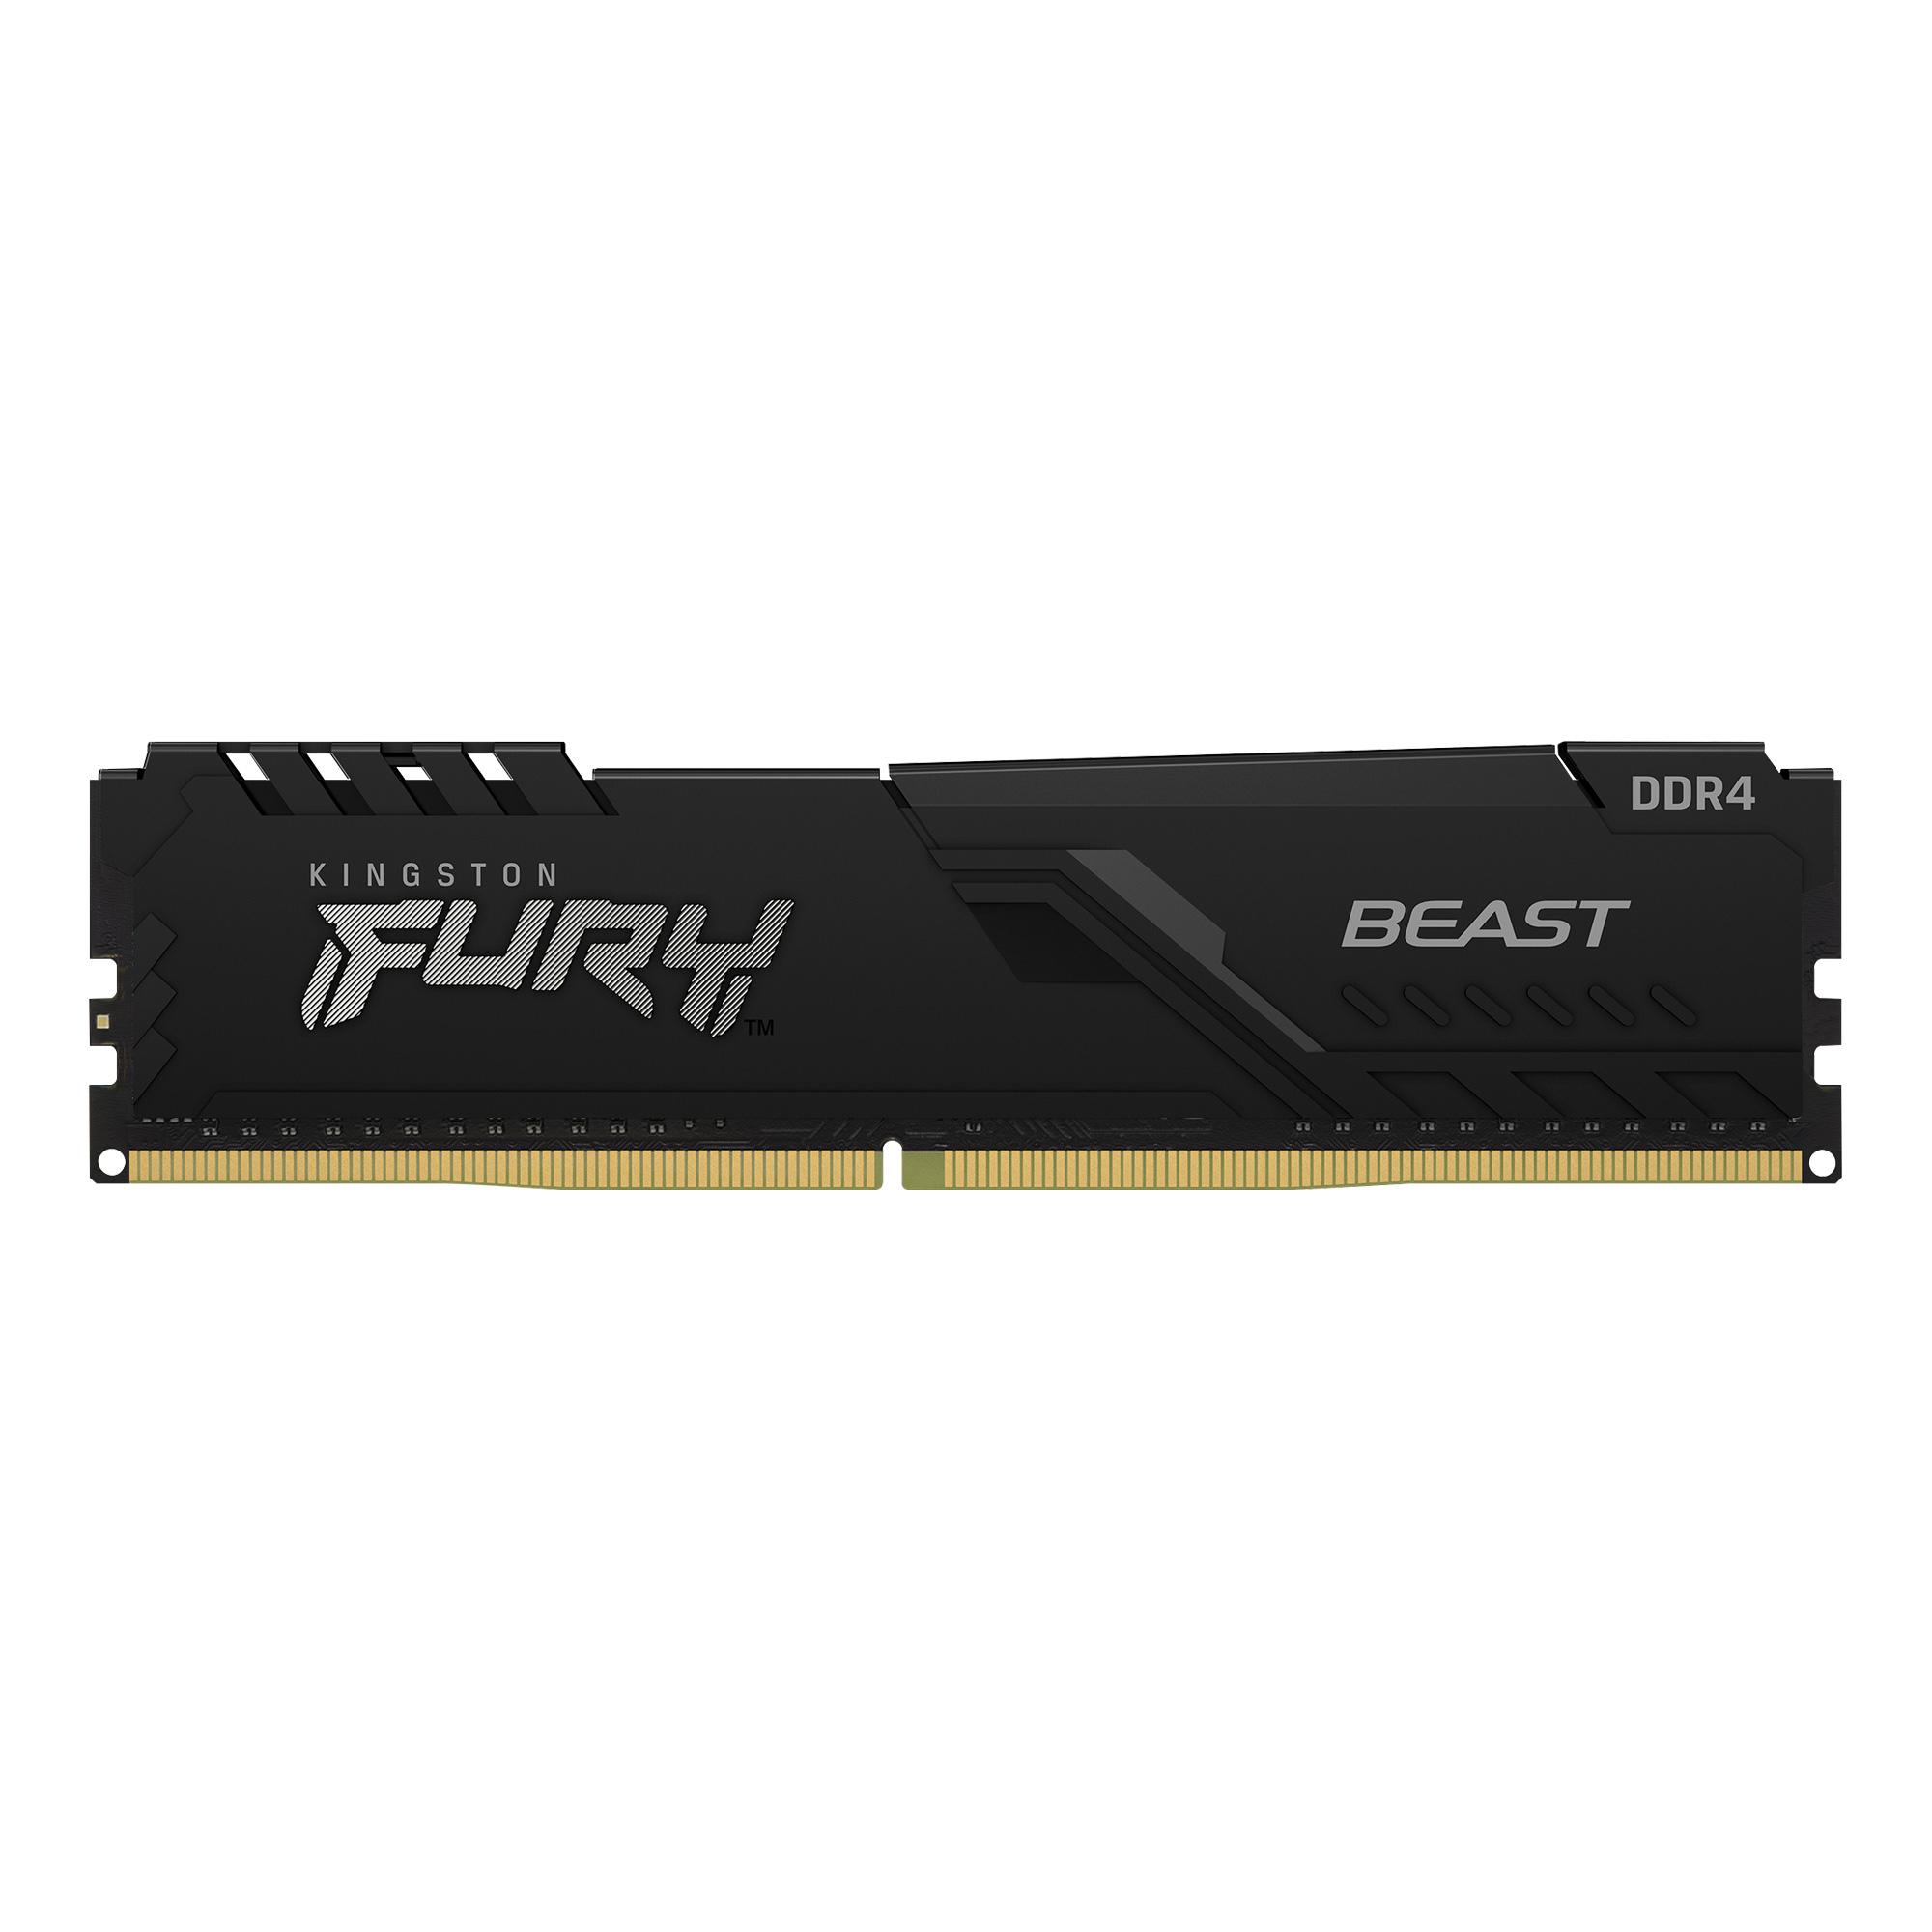 FURY BEAST MóDULO DE MEMORIA 8 GB 1 X 8 GB DDR4 2666 MHZ